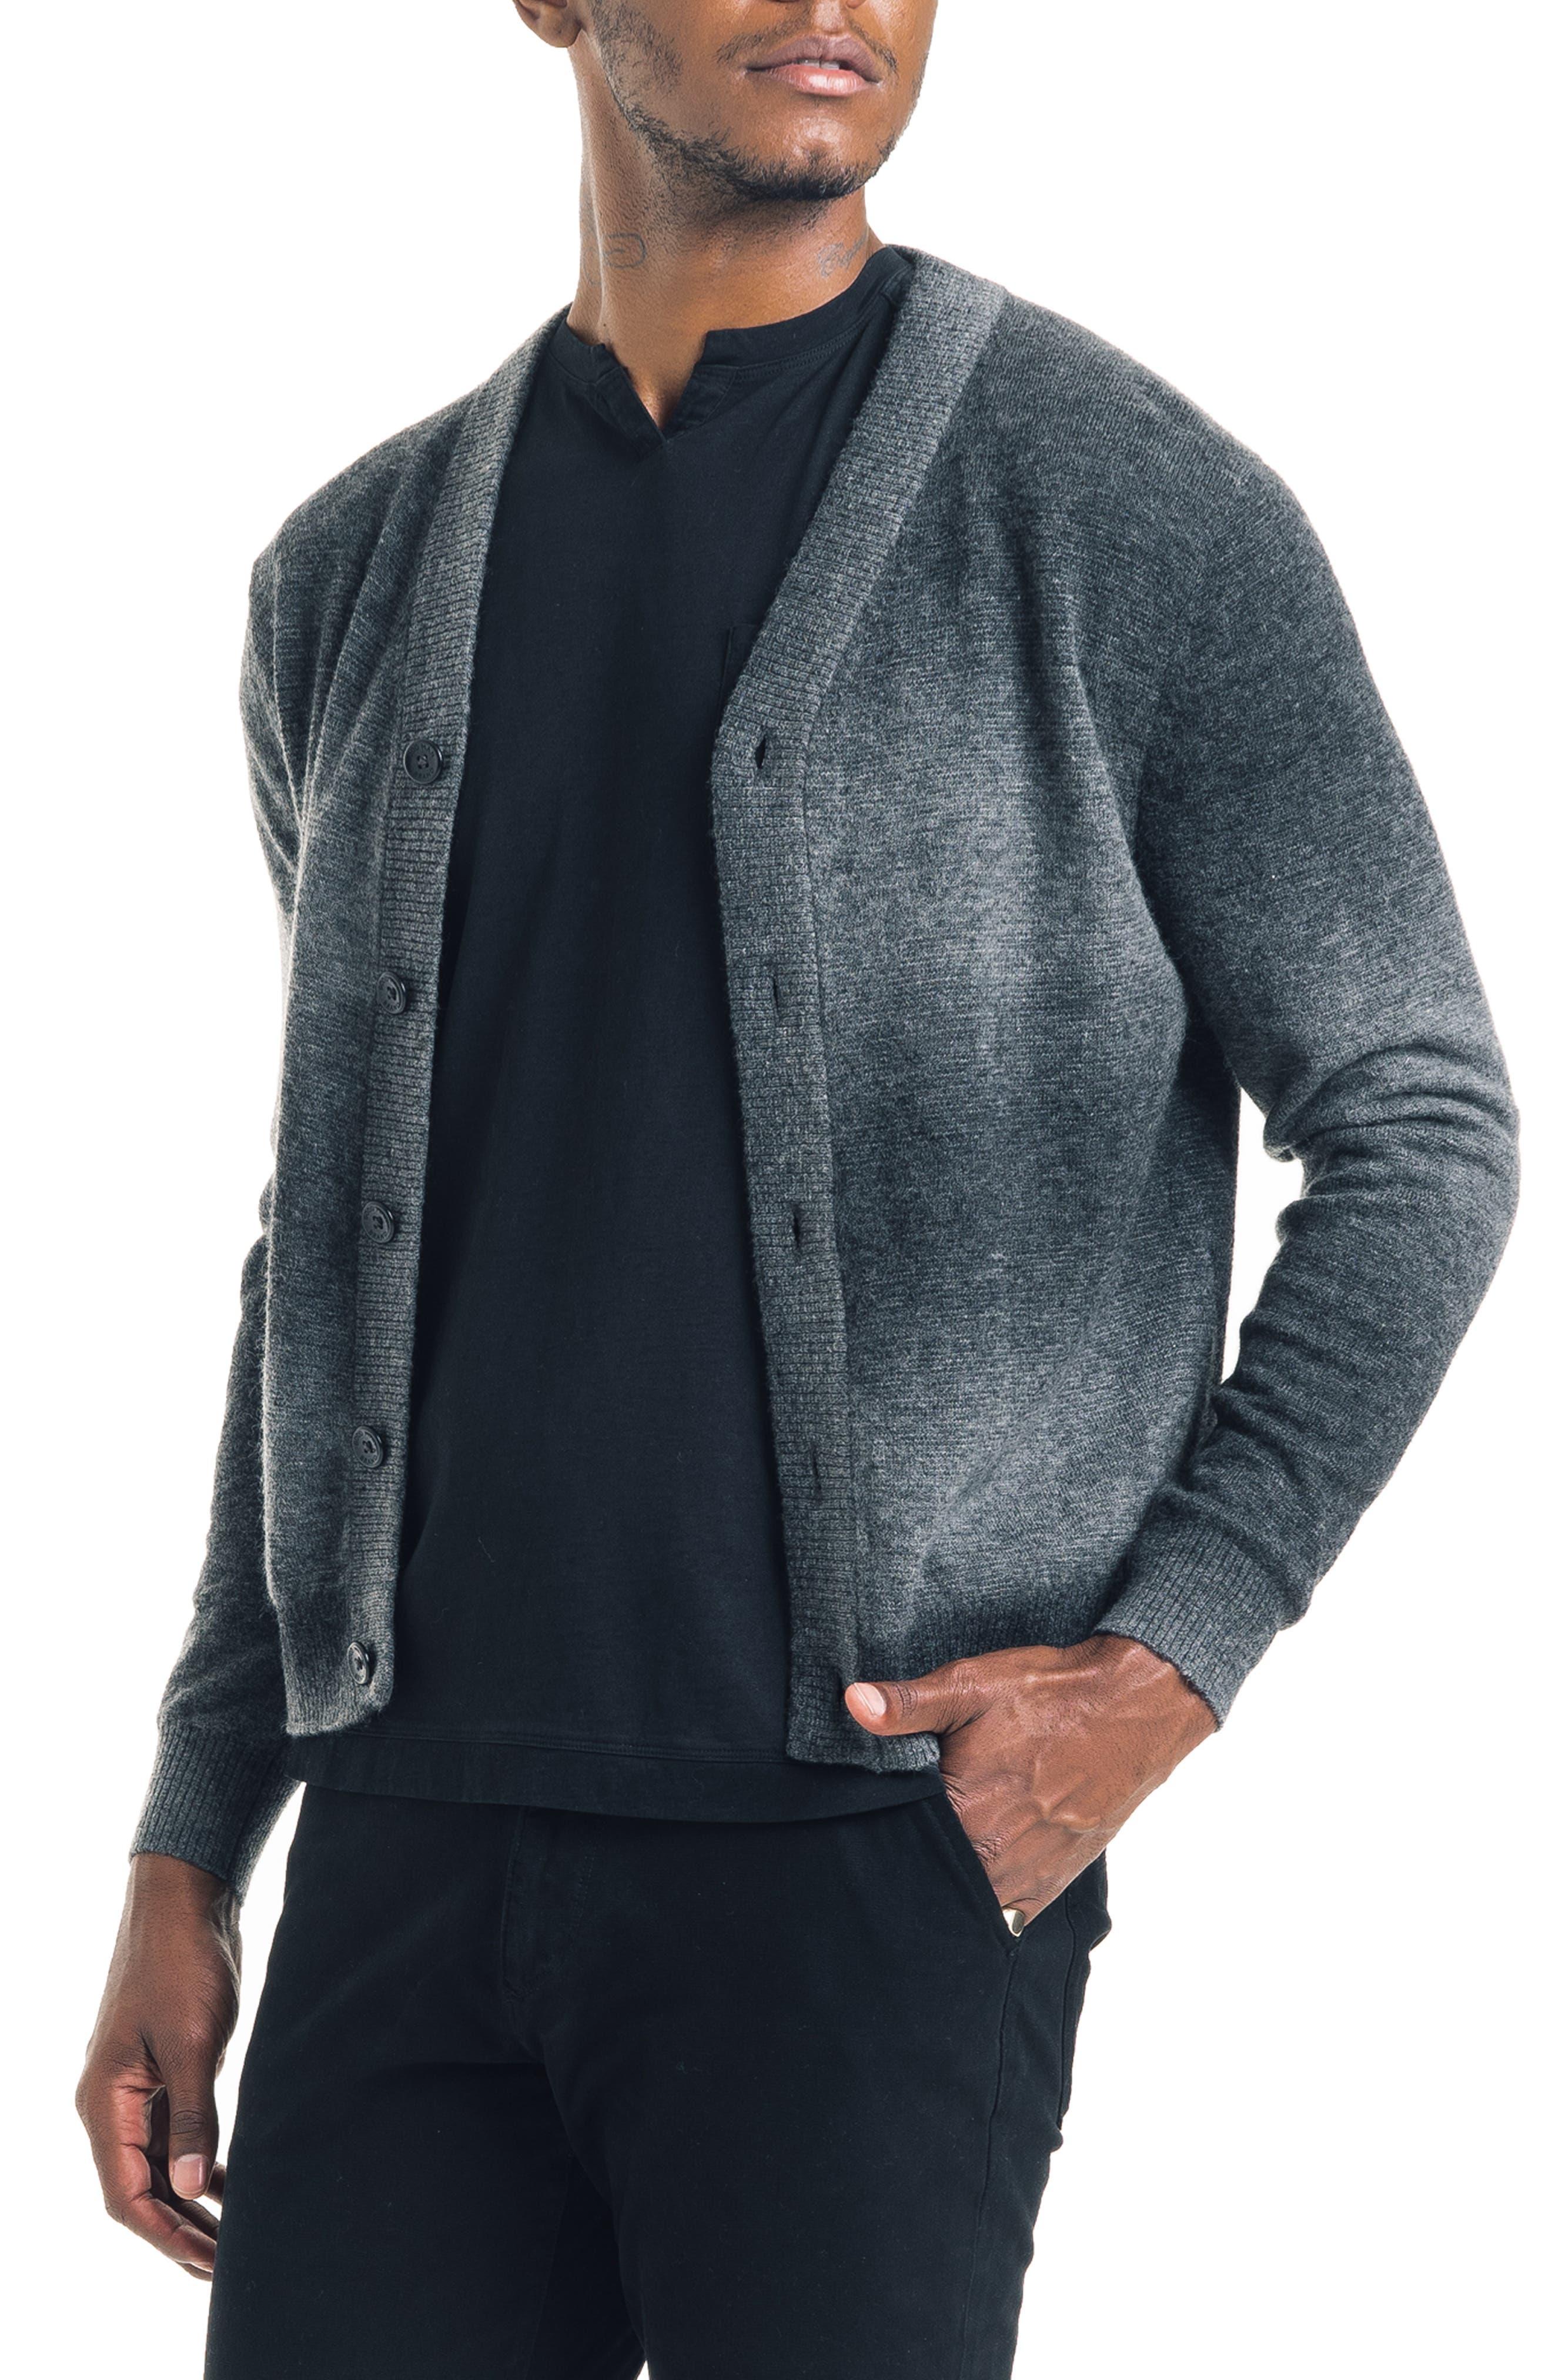 Modern Slim Fit Merino Wool Blend Cardigan,                         Main,                         color, BLACK / GREY